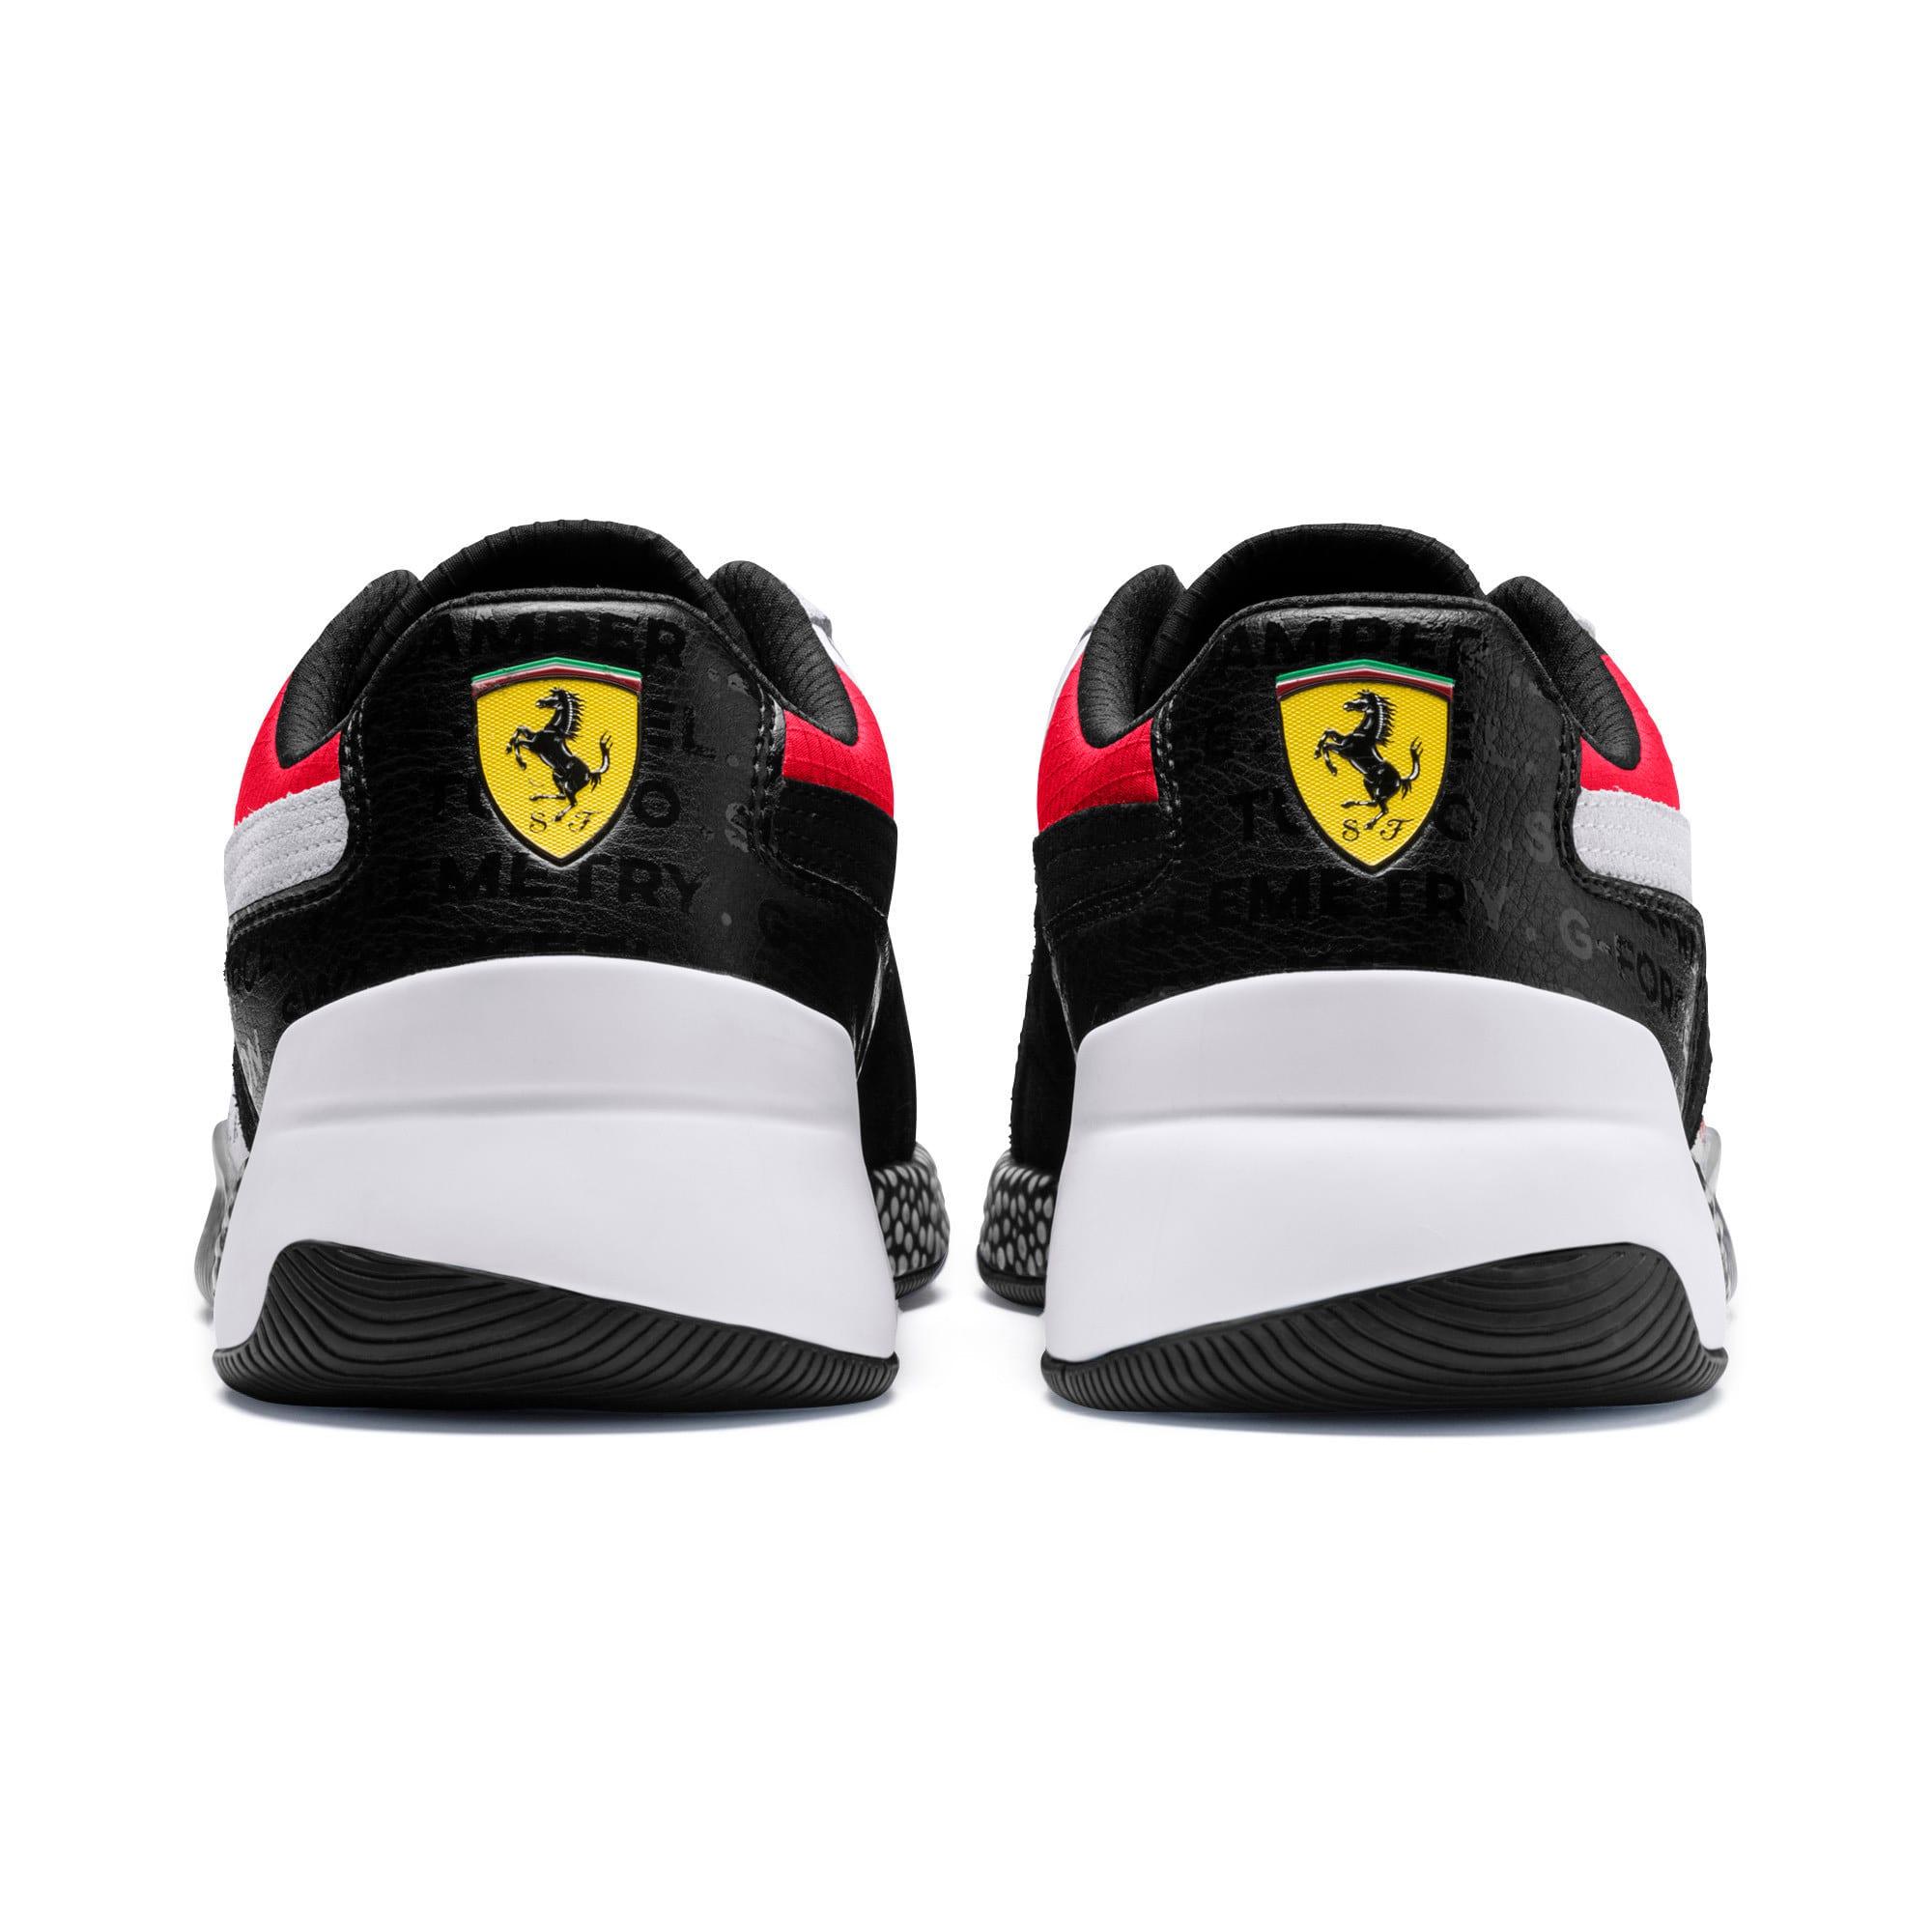 Thumbnail 3 of フェラーリ スピード ハイブリッド, Black-White-Rosso Corsa, medium-JPN